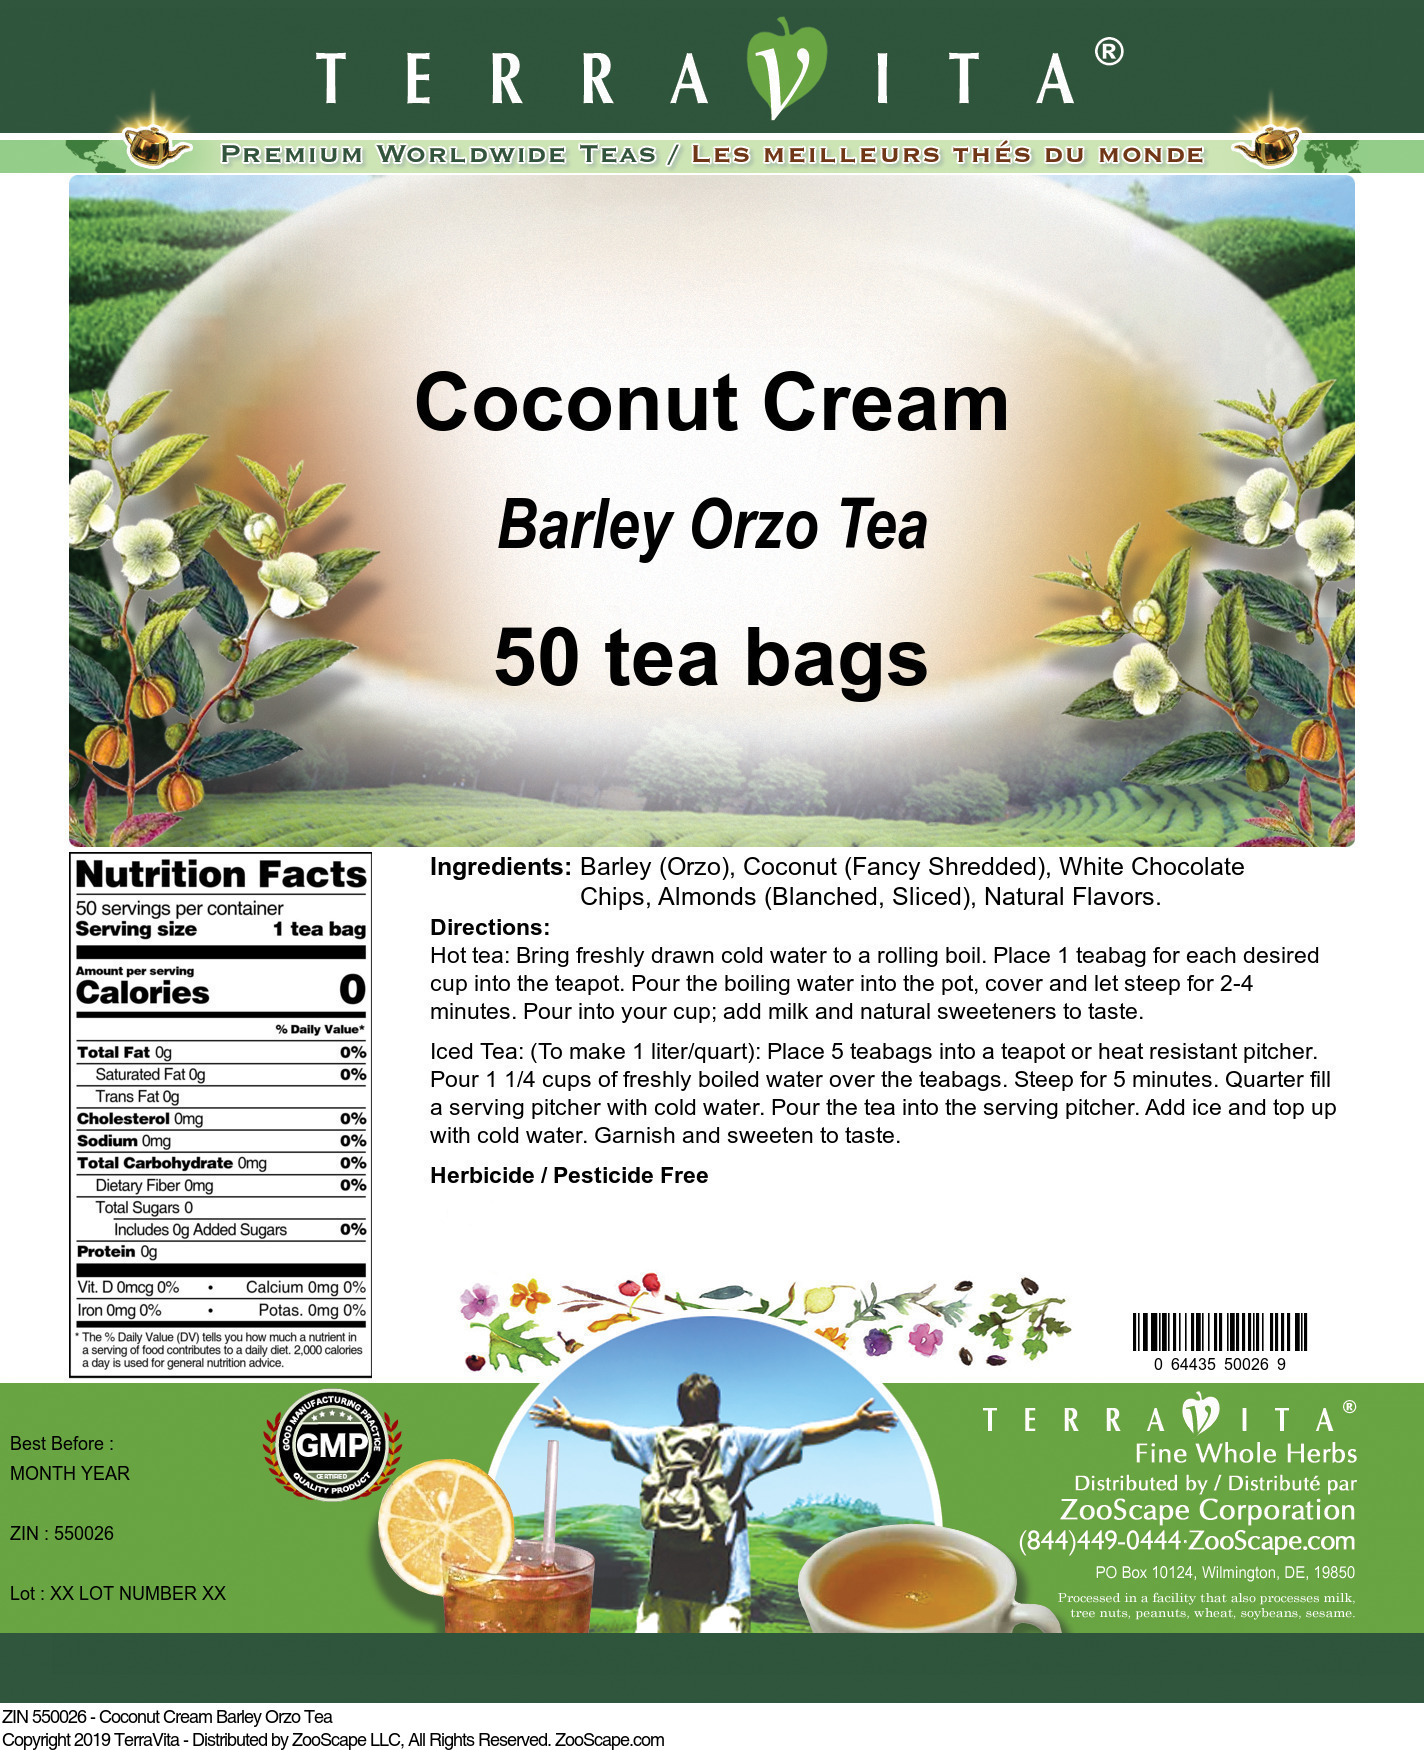 Coconut Cream Barley Orzo